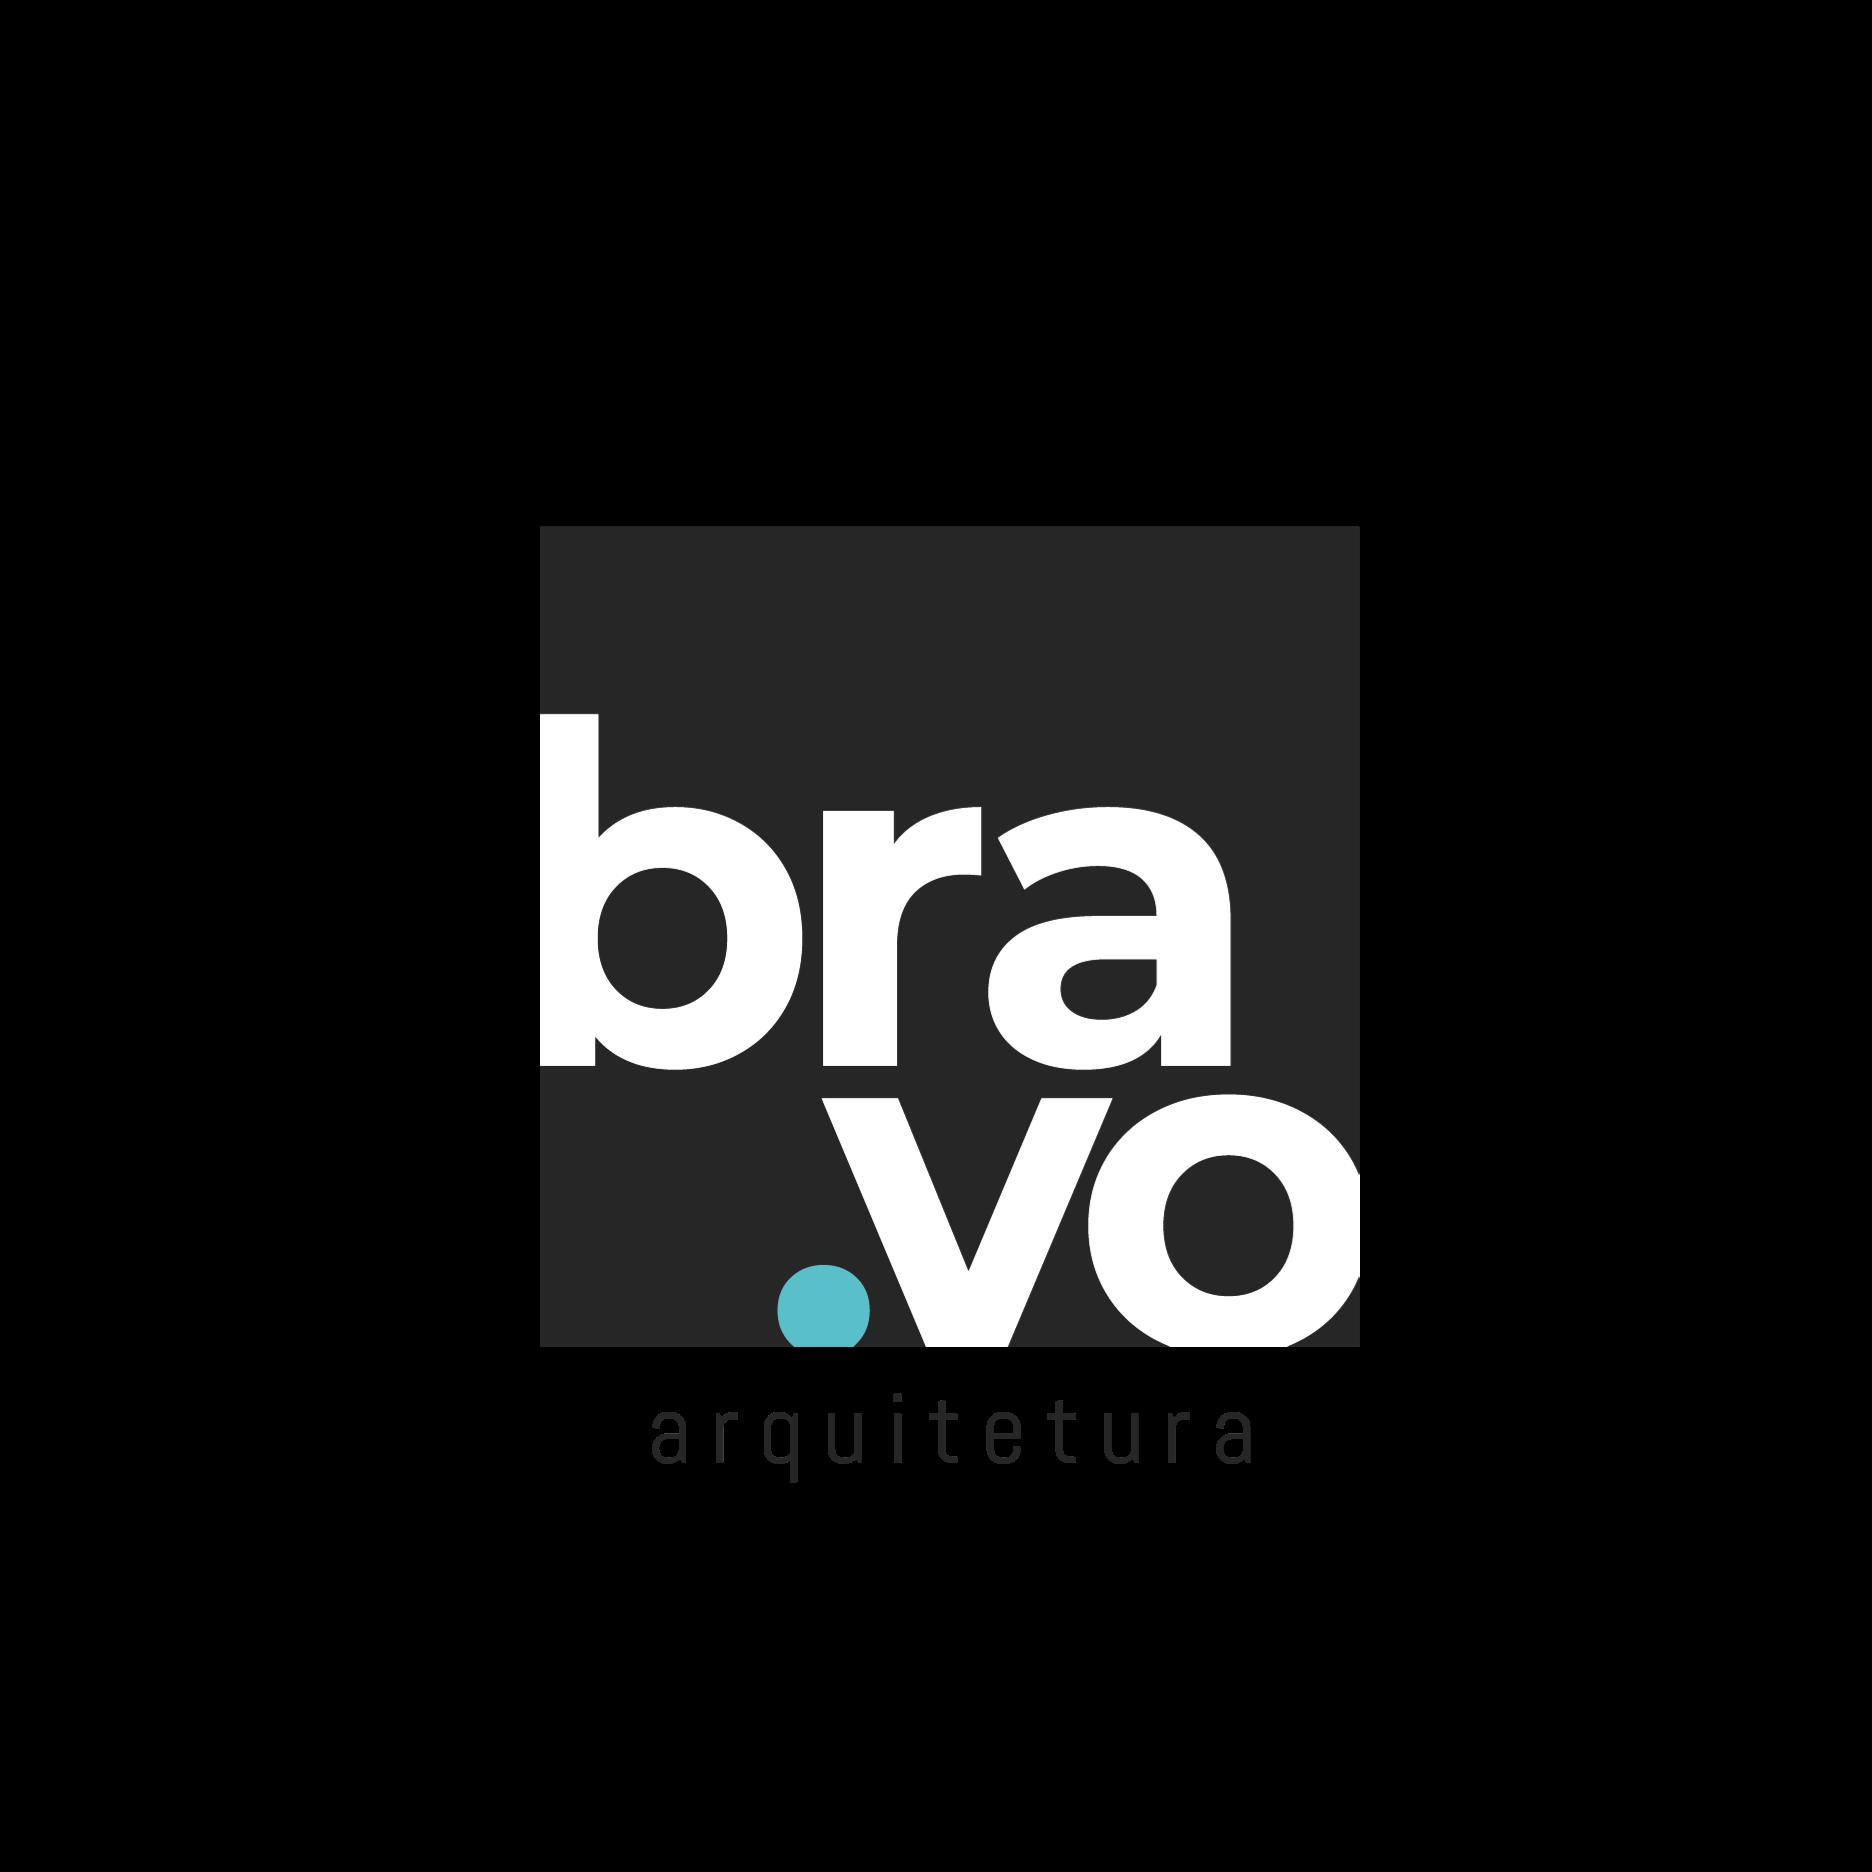 Bravo Arquitetura